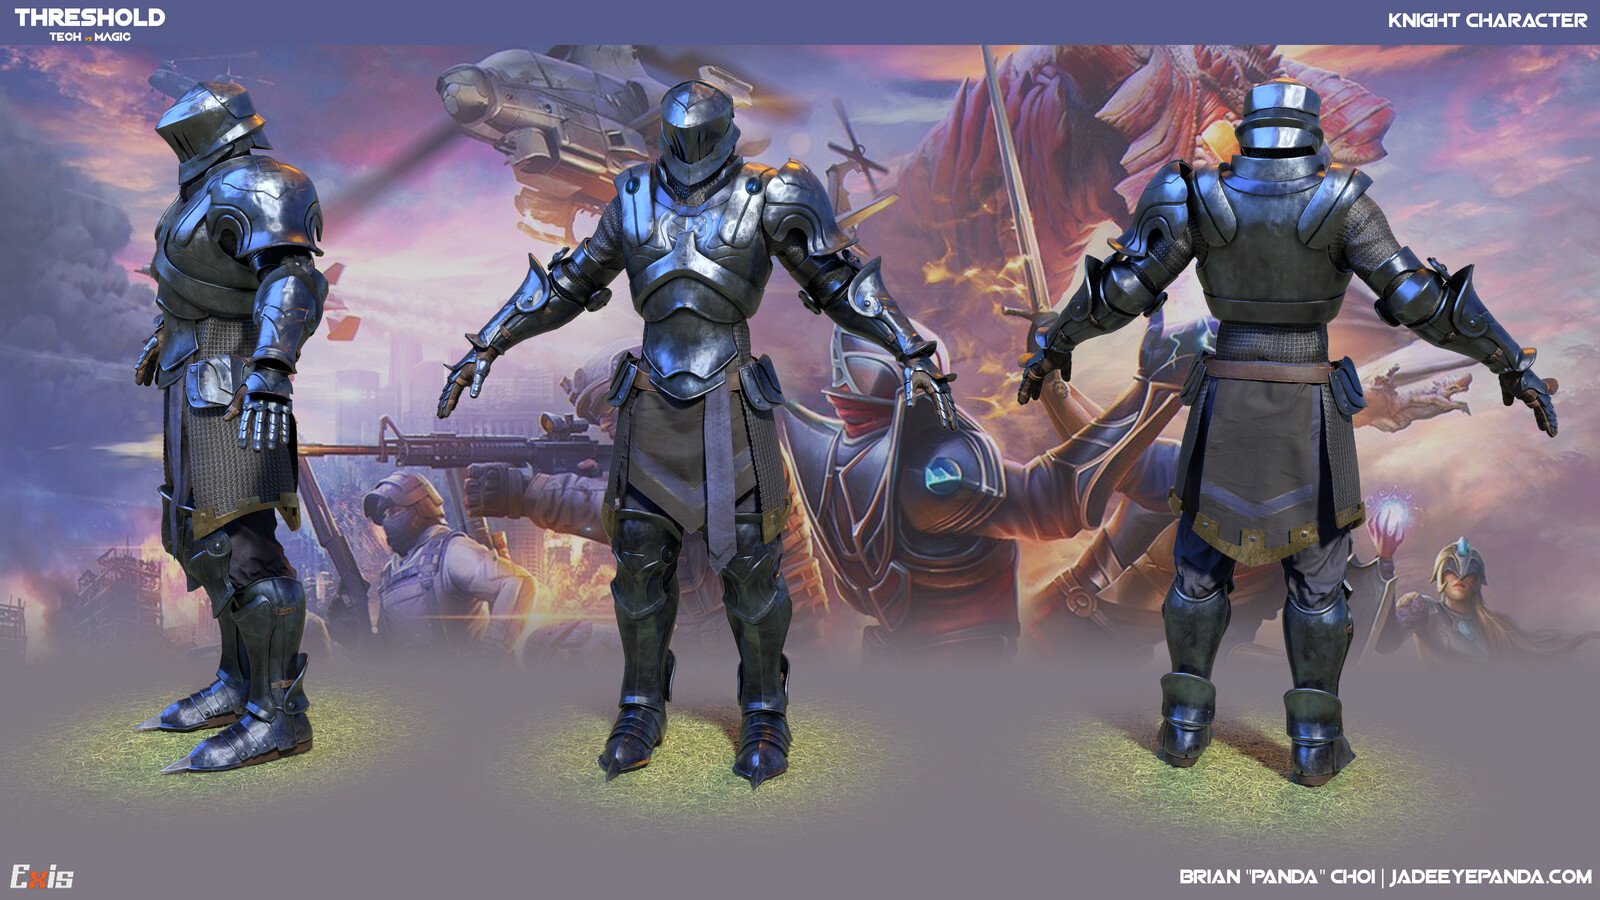 Knight - Threshold: Tech Vs Magic